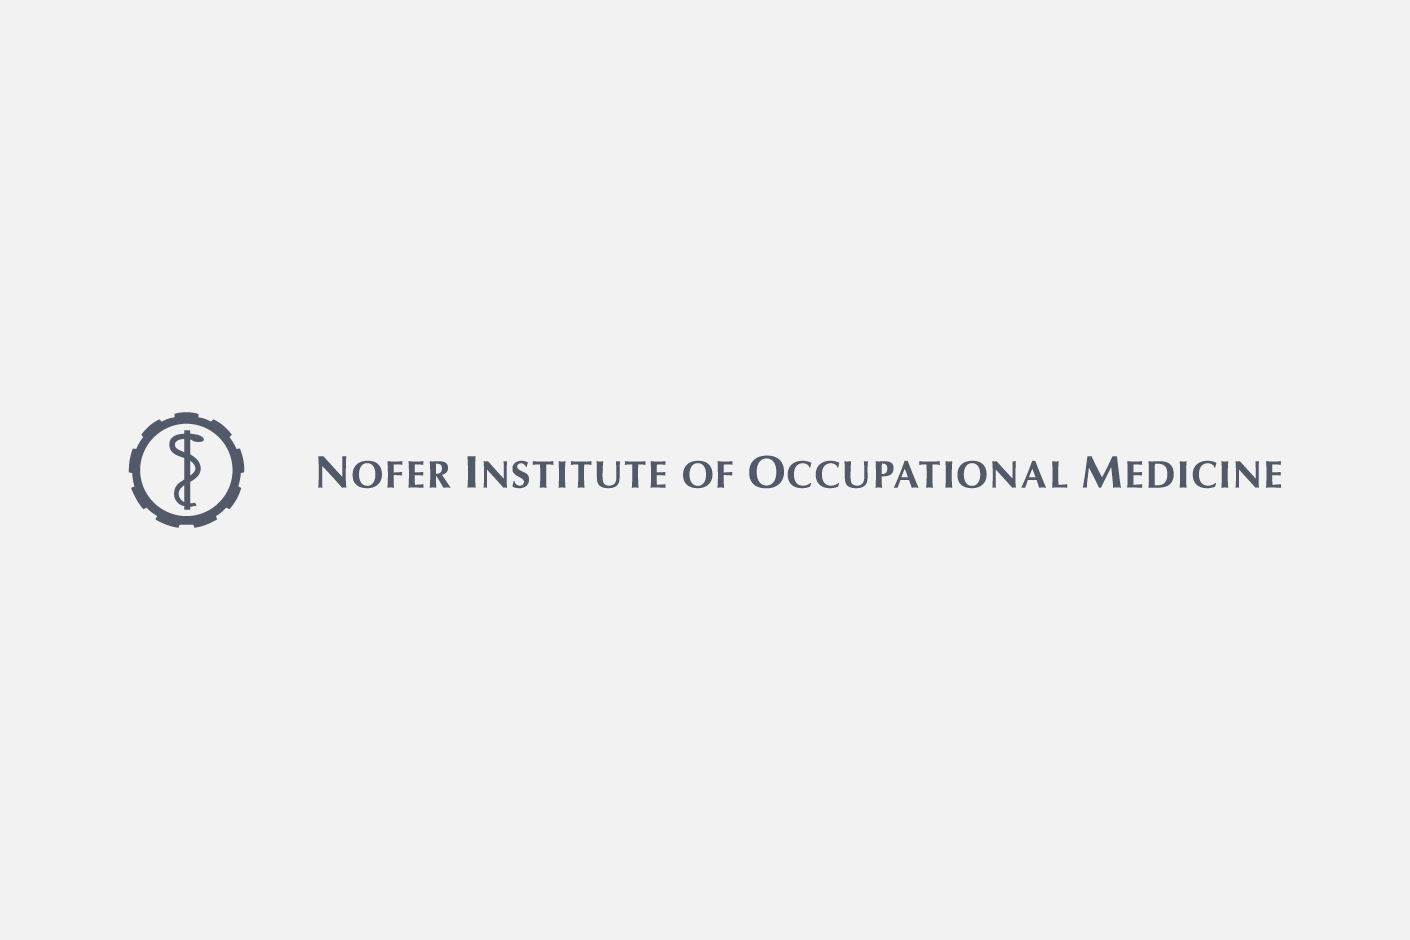 Nofer Institute of Occupational Medicine